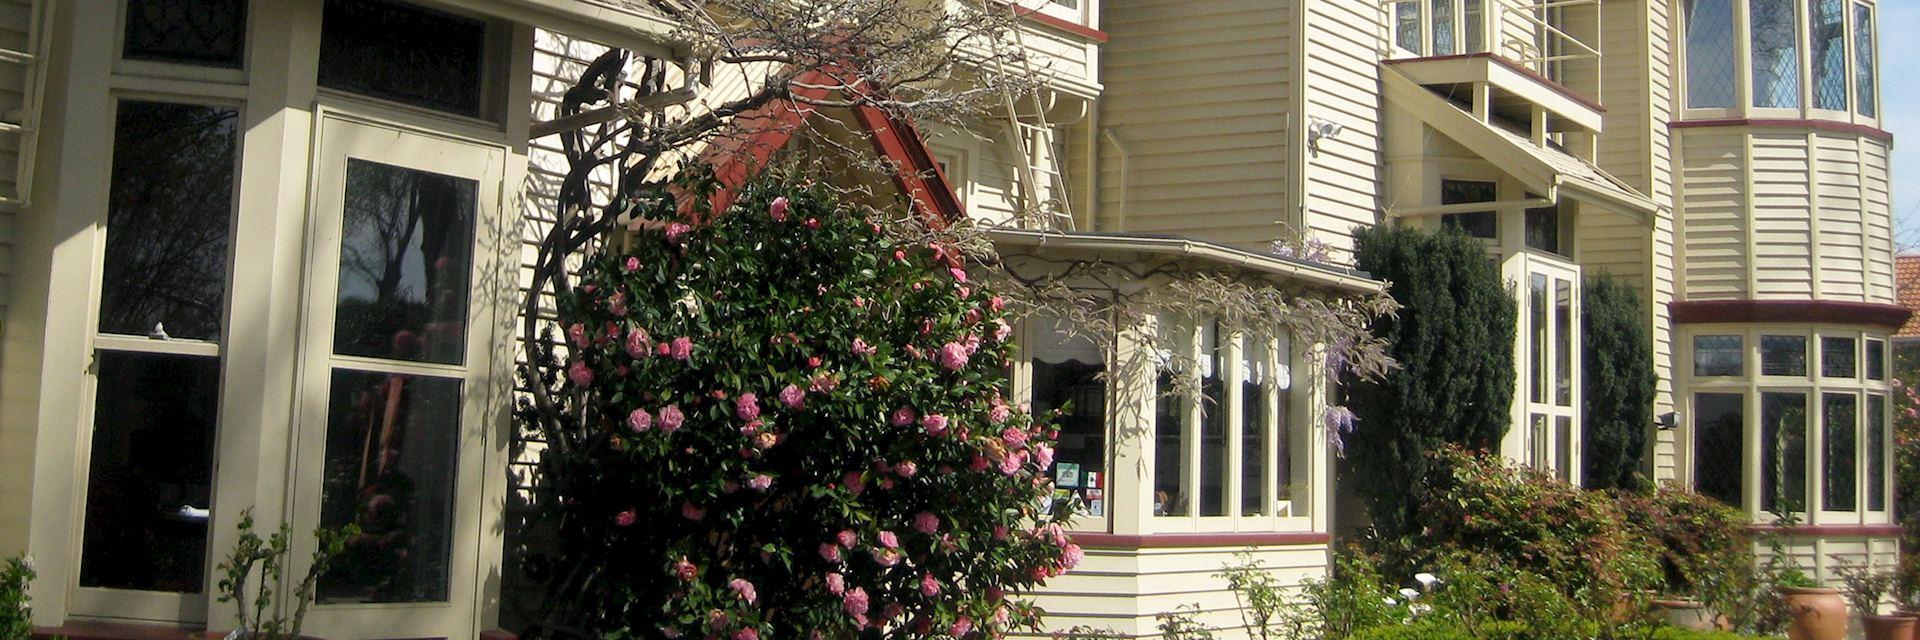 Eliza's Manor Boutique Hotel, Christchurch